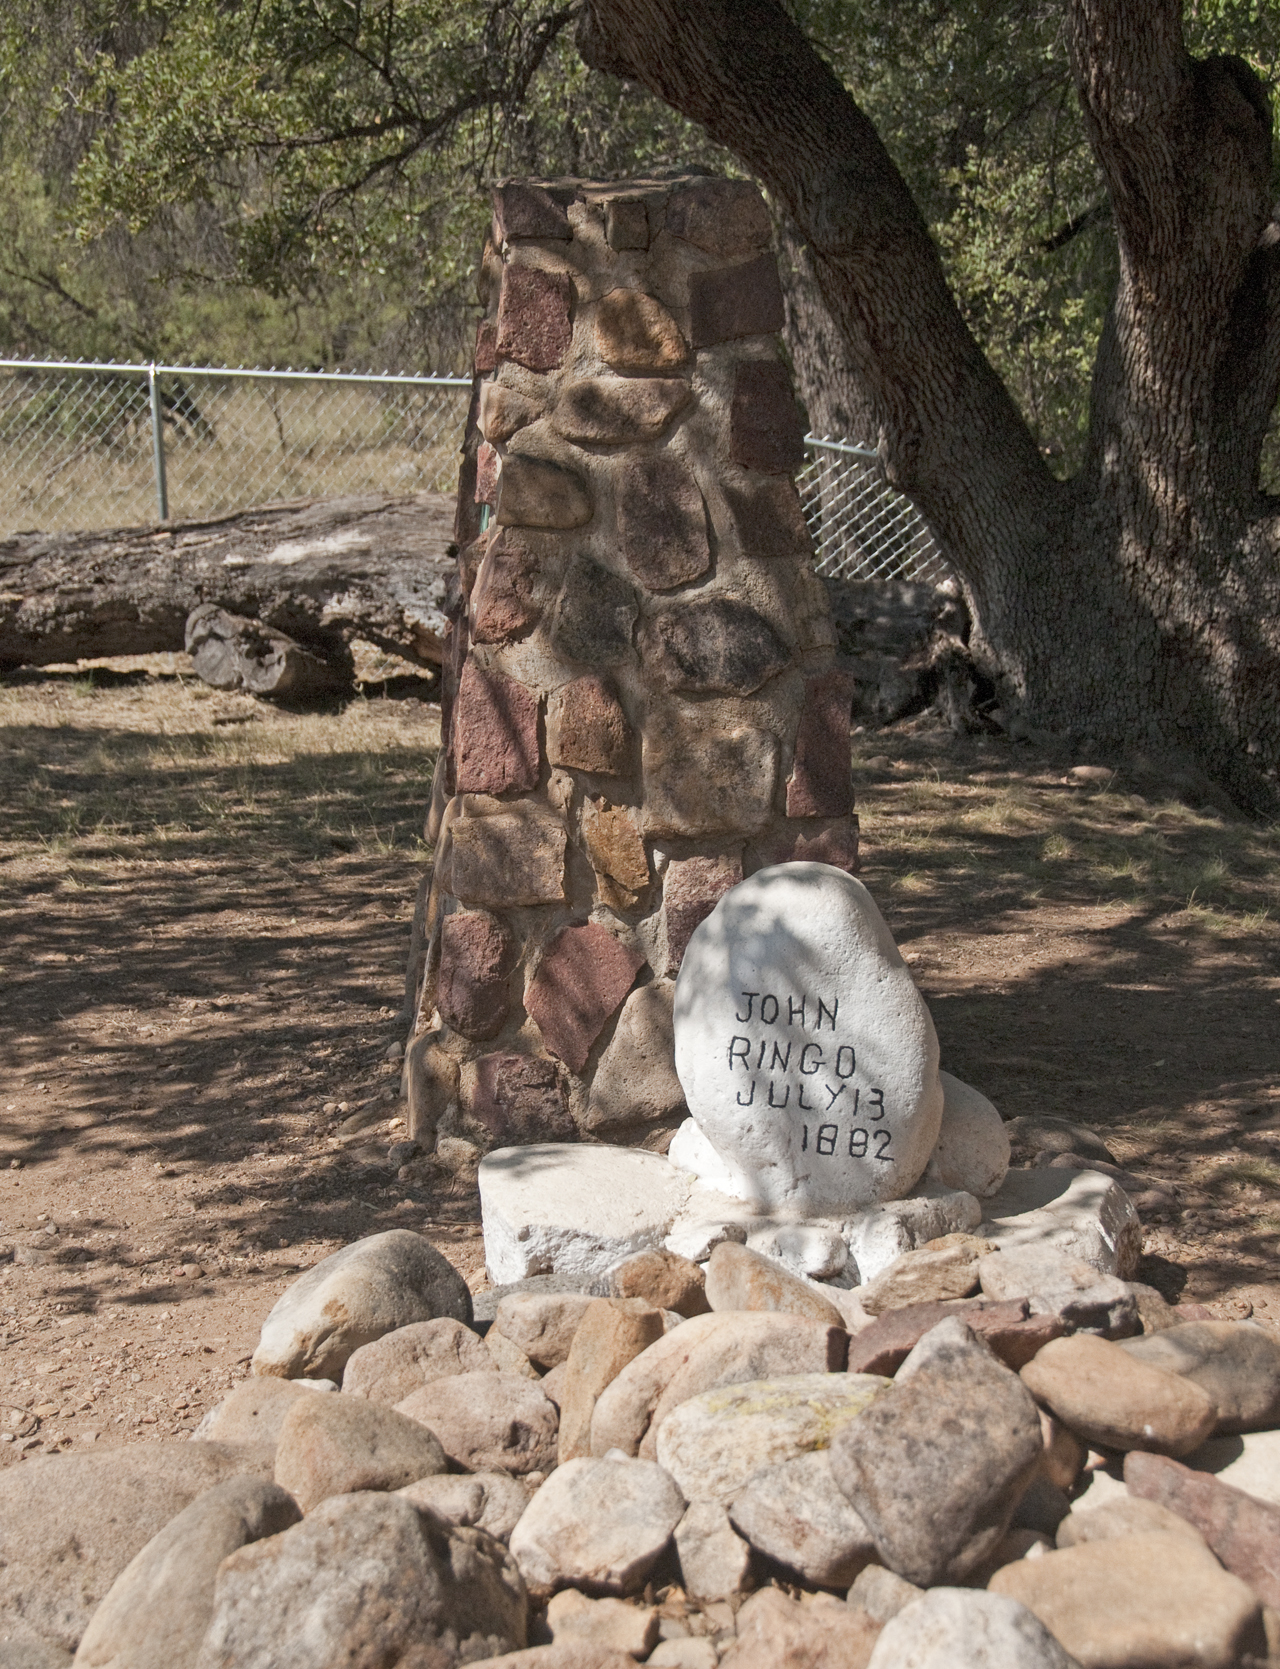 Historial marker at Johnny Ringo's grave